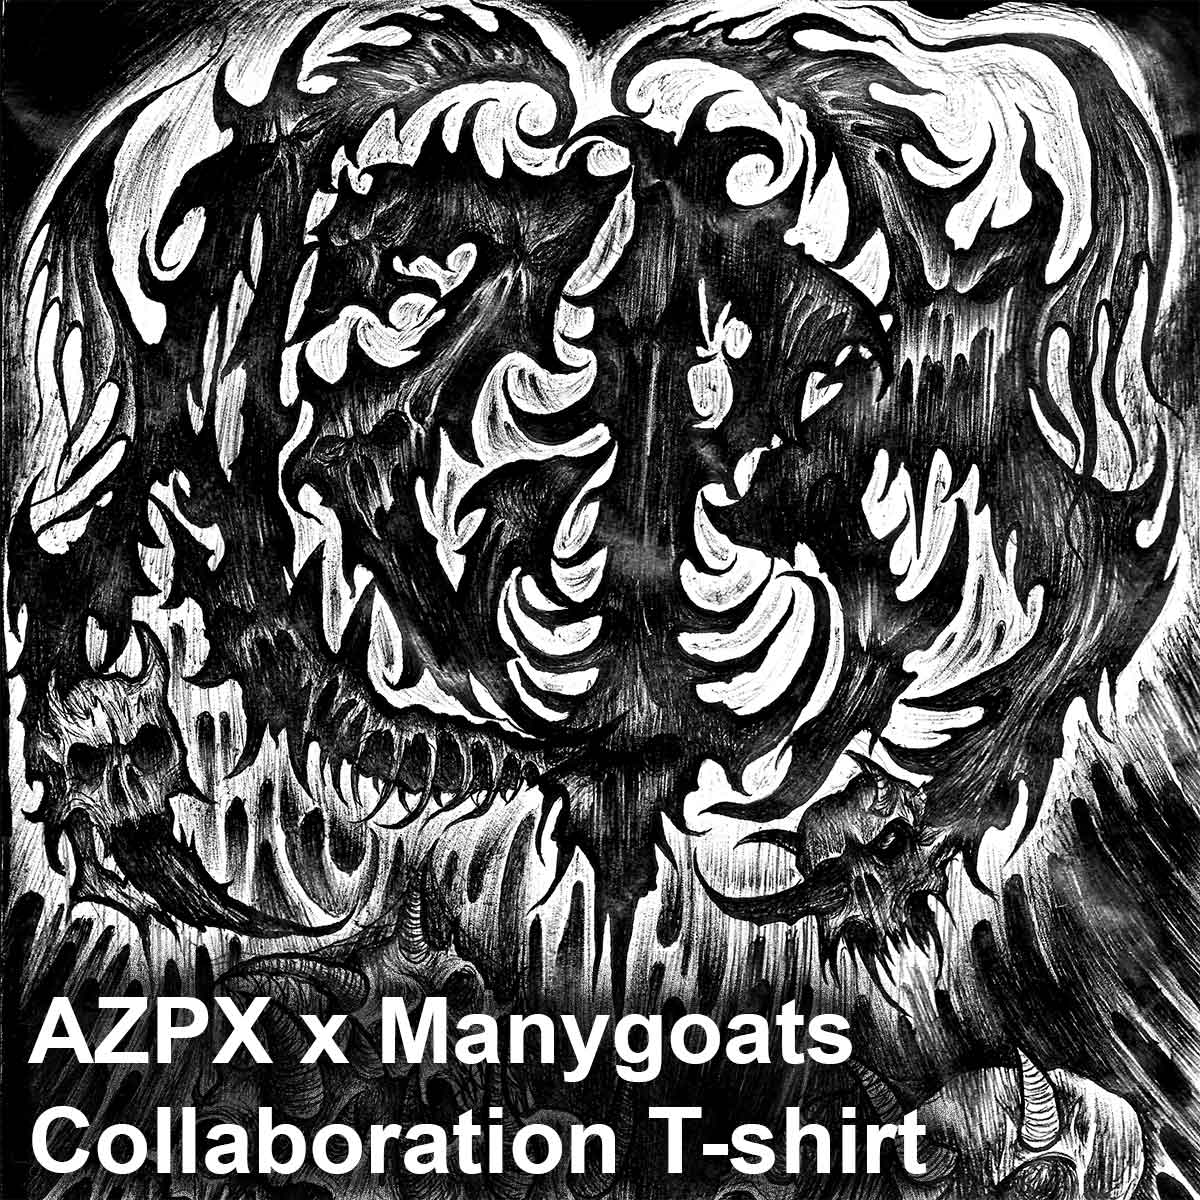 AZPX x Manygoats Collaboration